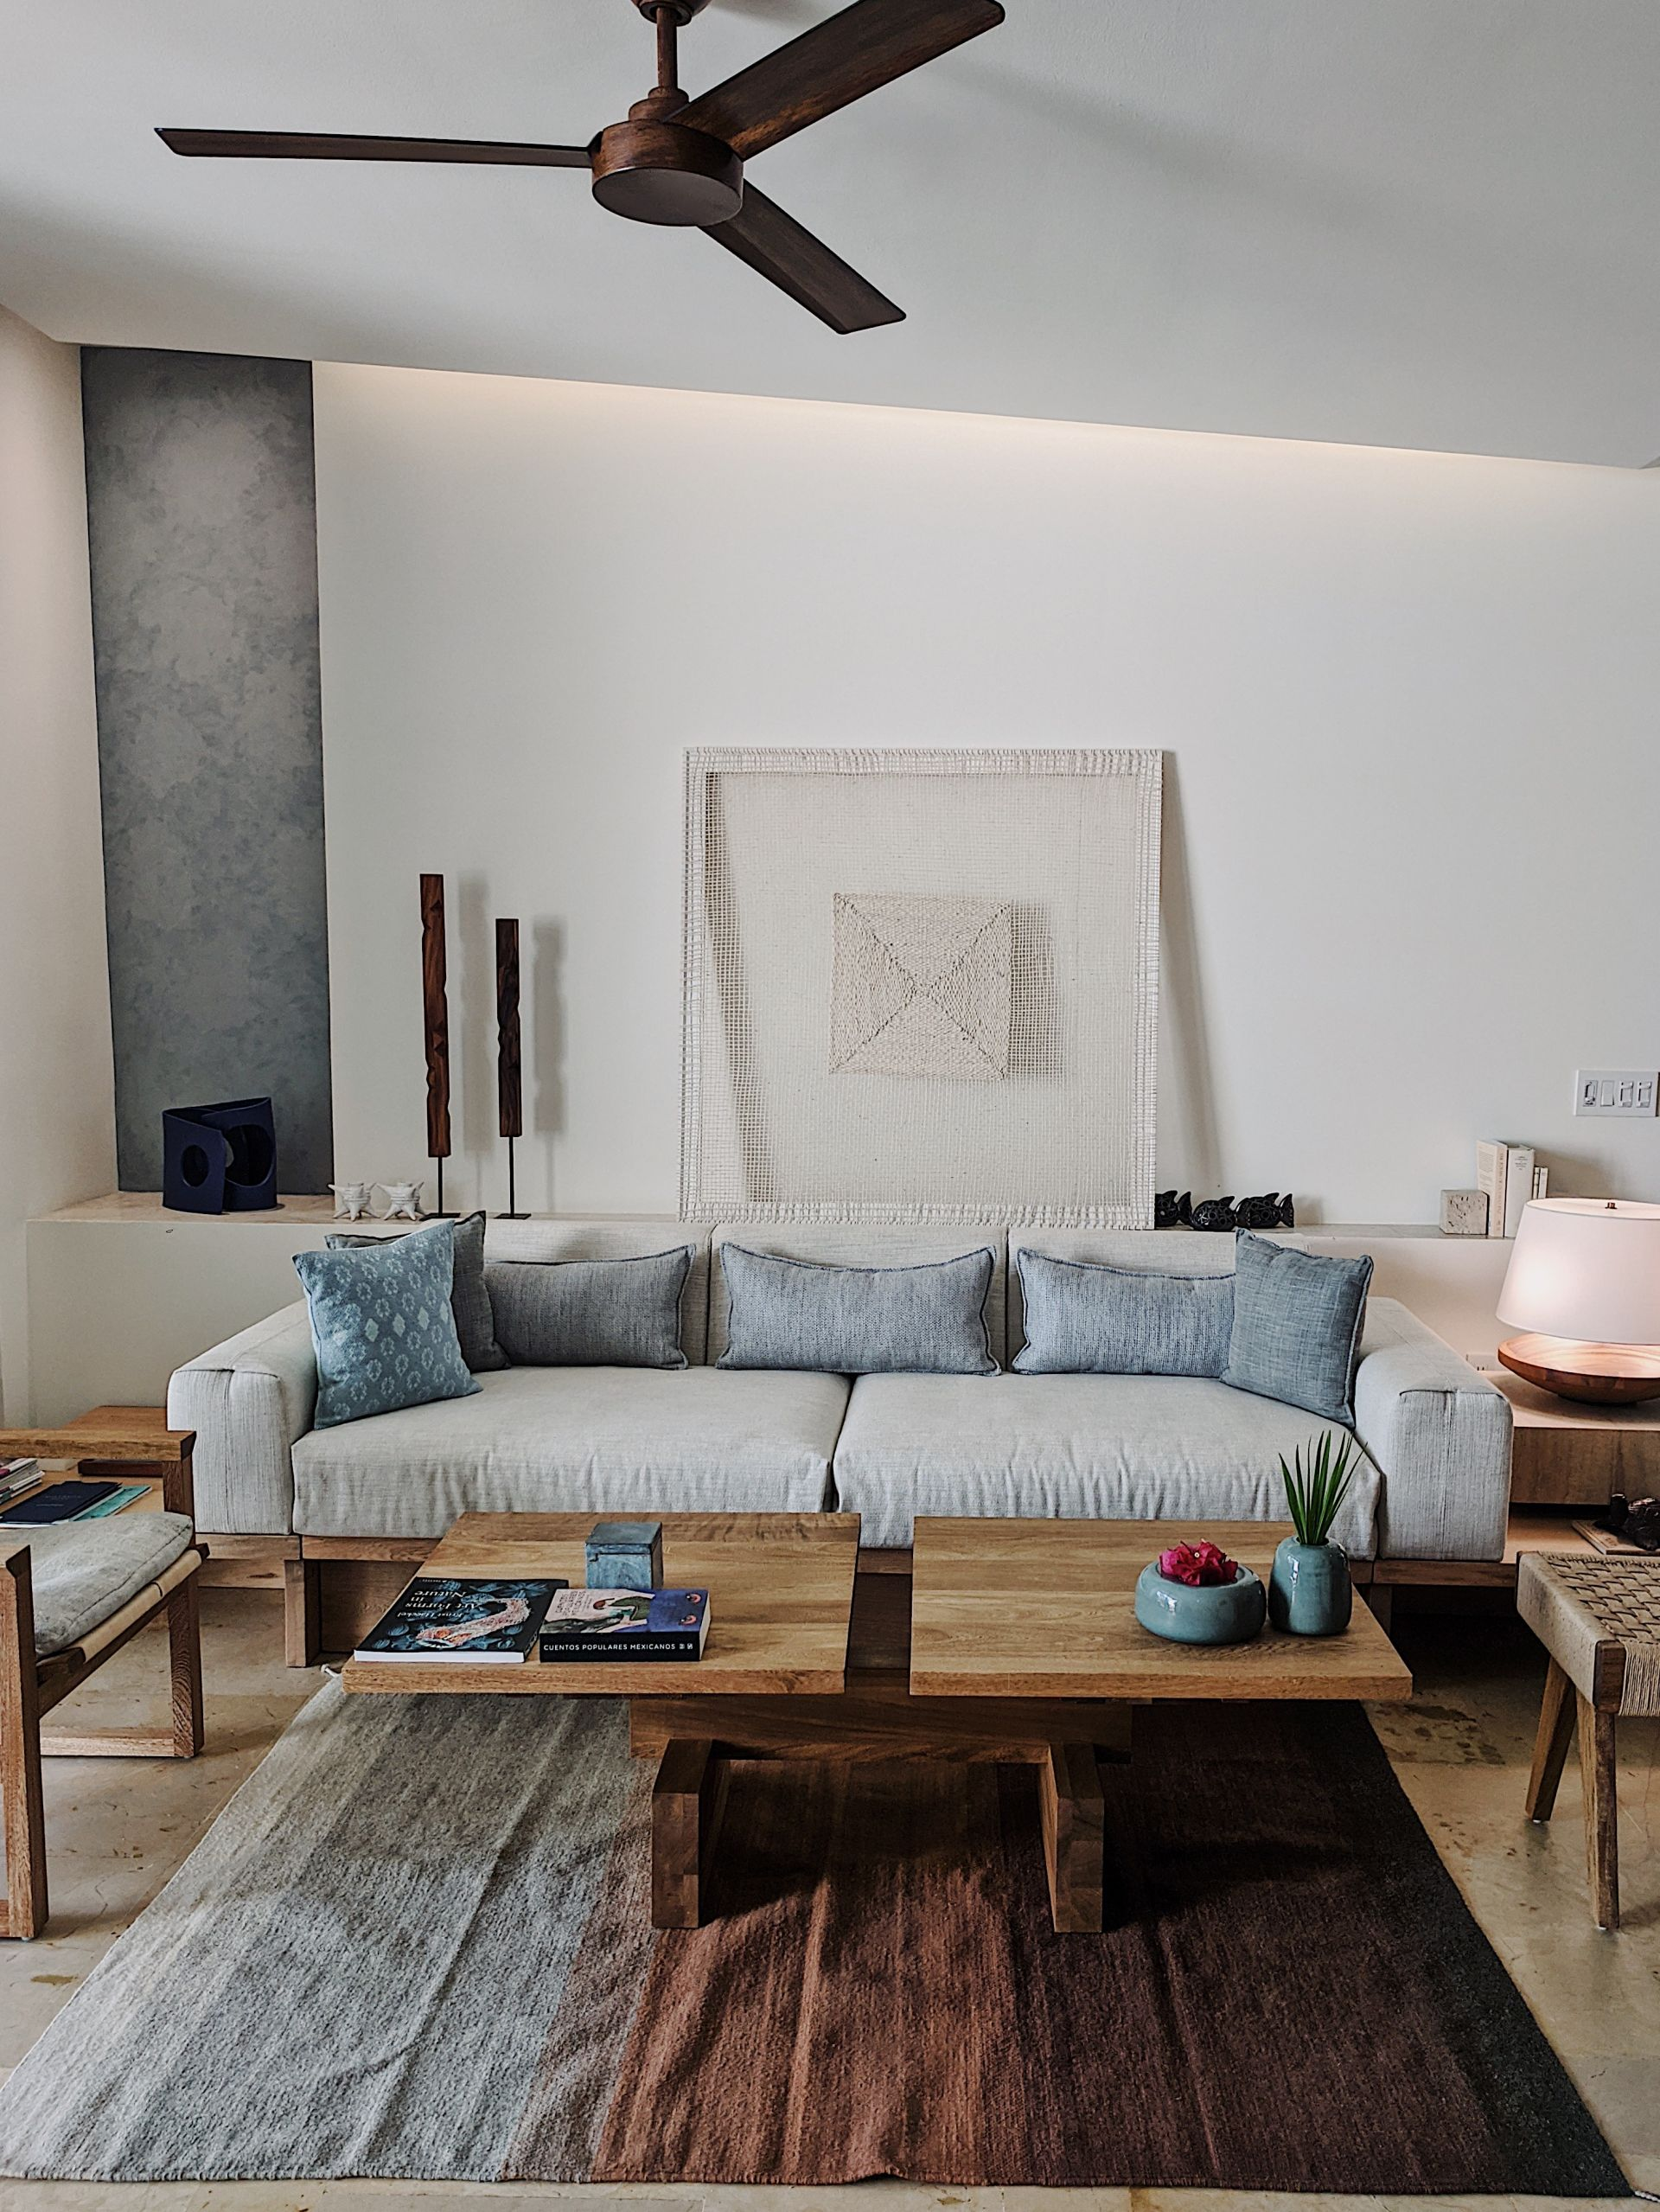 Room interior at Rosewood Mayakoba